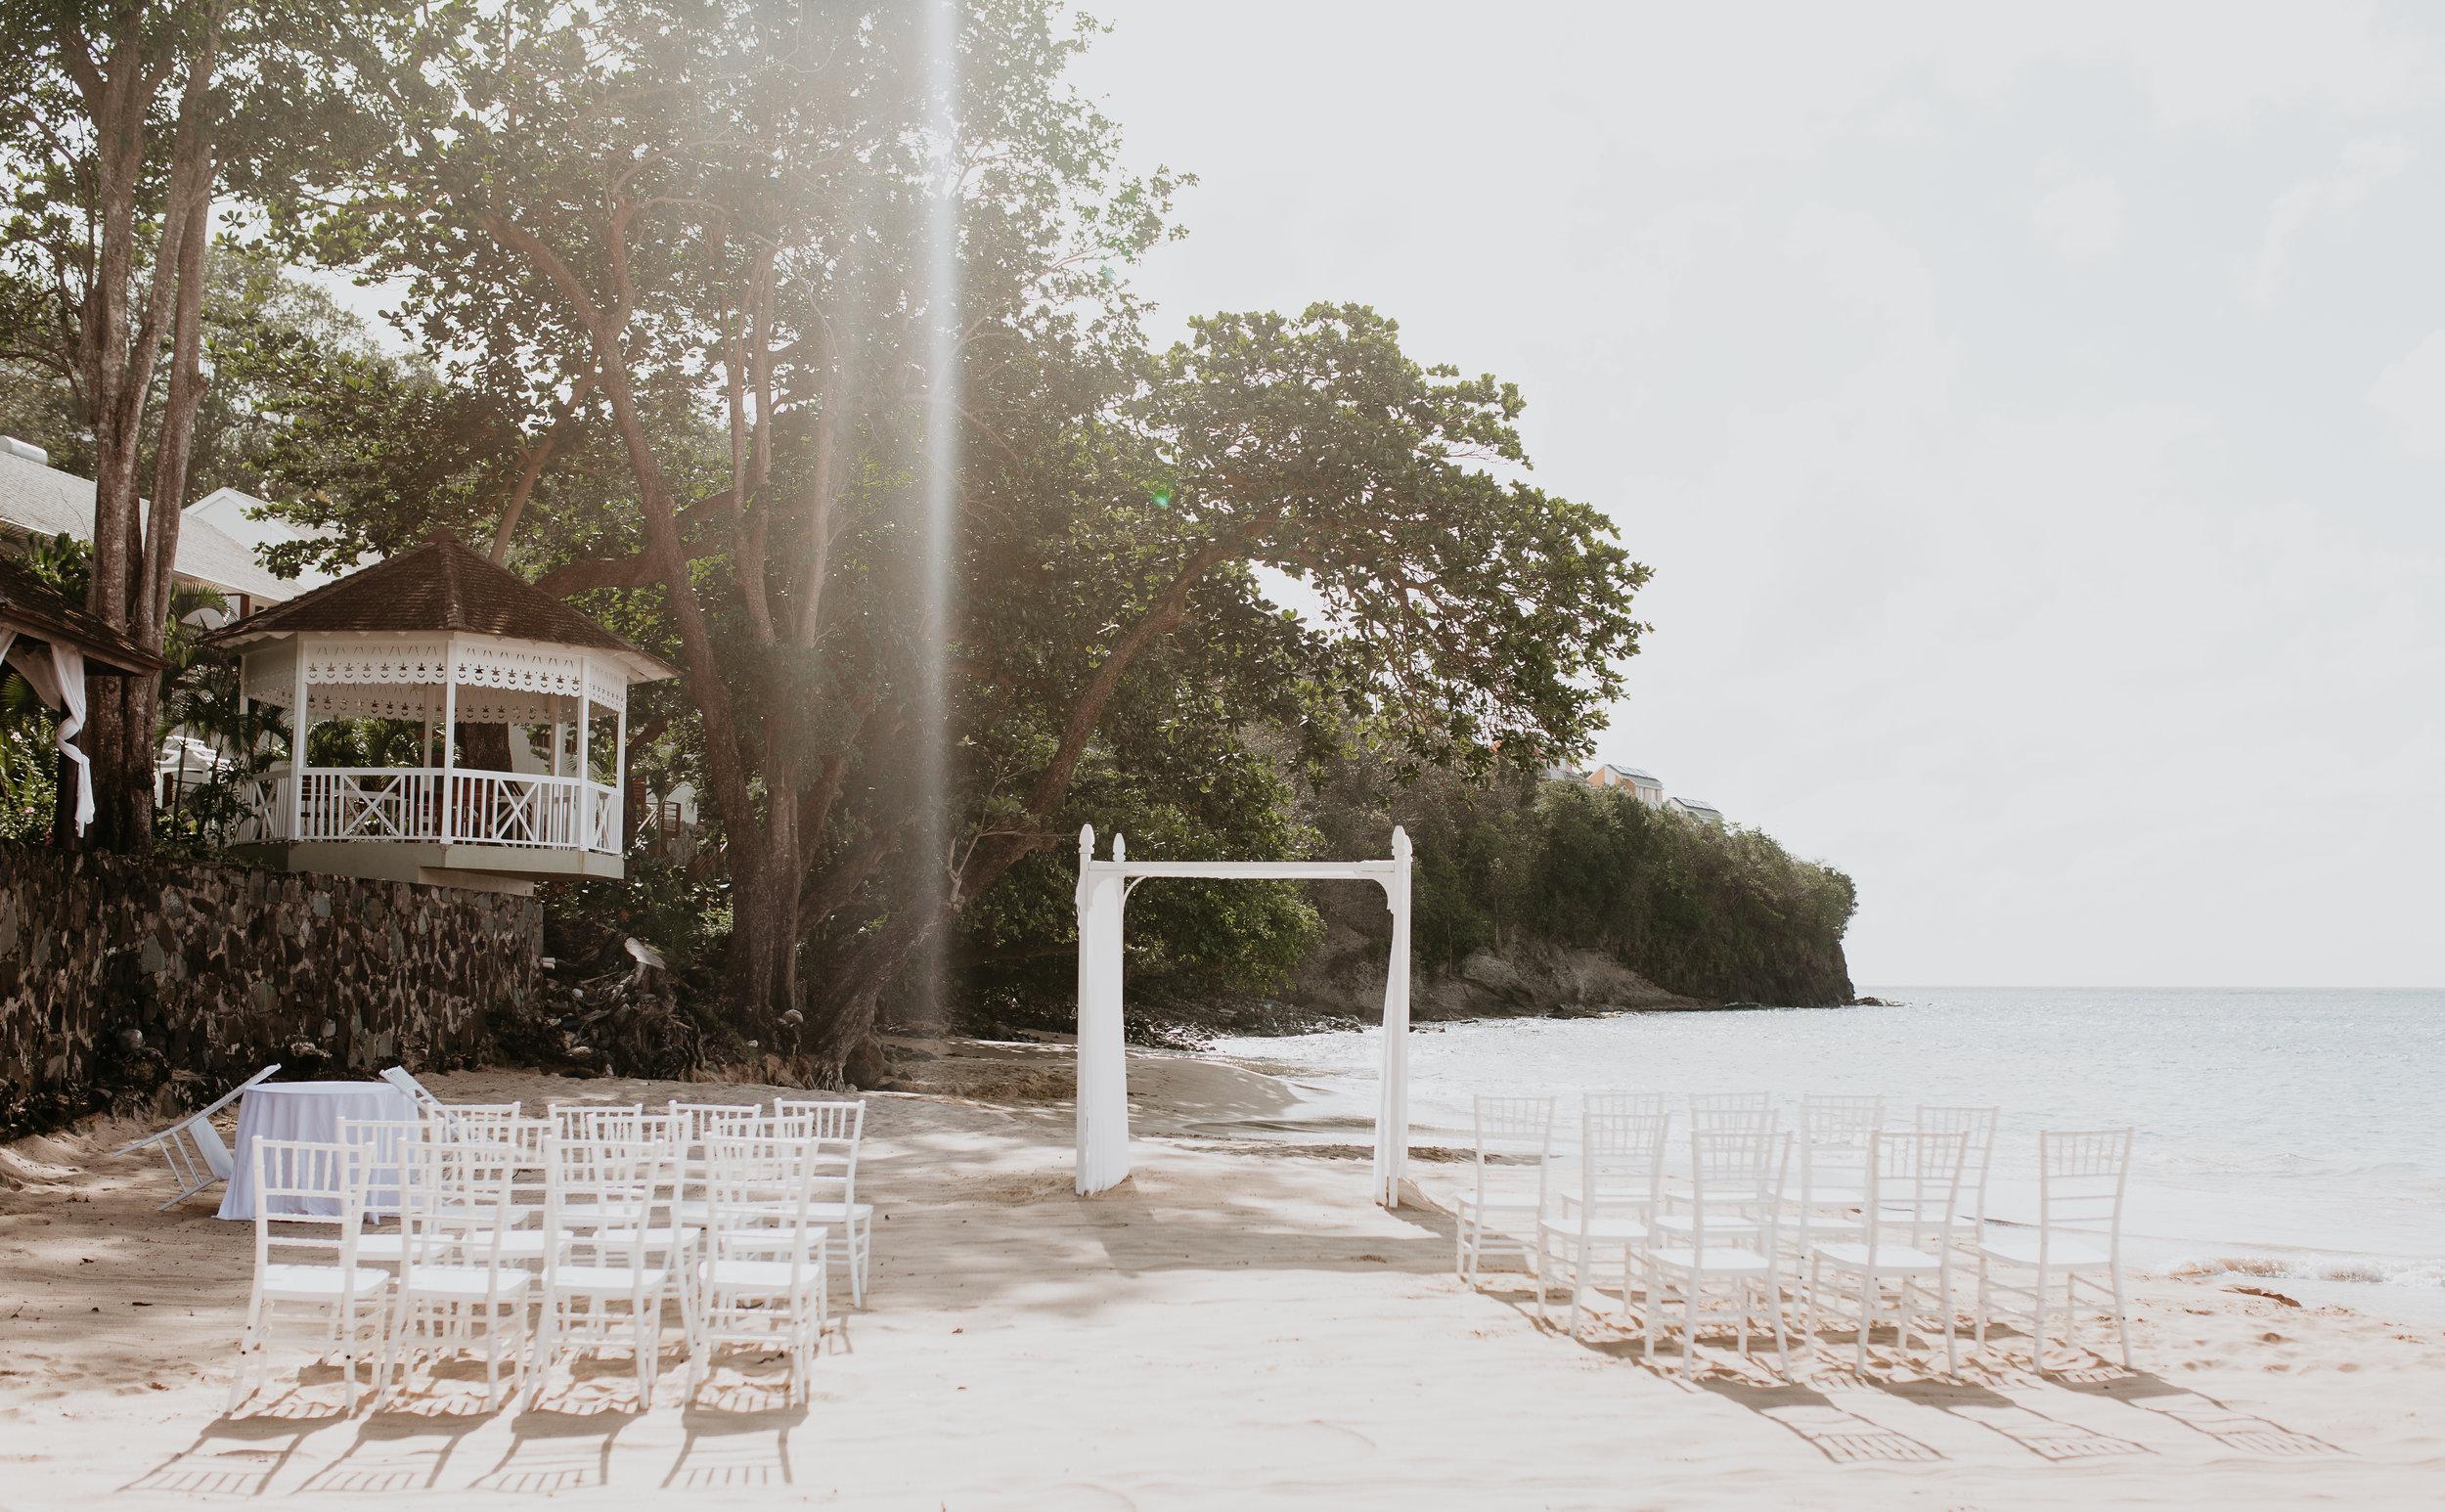 nicole-daacke-photography-destination-wedding-in-st-lucia-sandals-la-toc-intimate-island-wedding-carribean-elopement-photographer-chill-island-wedding-46.jpg